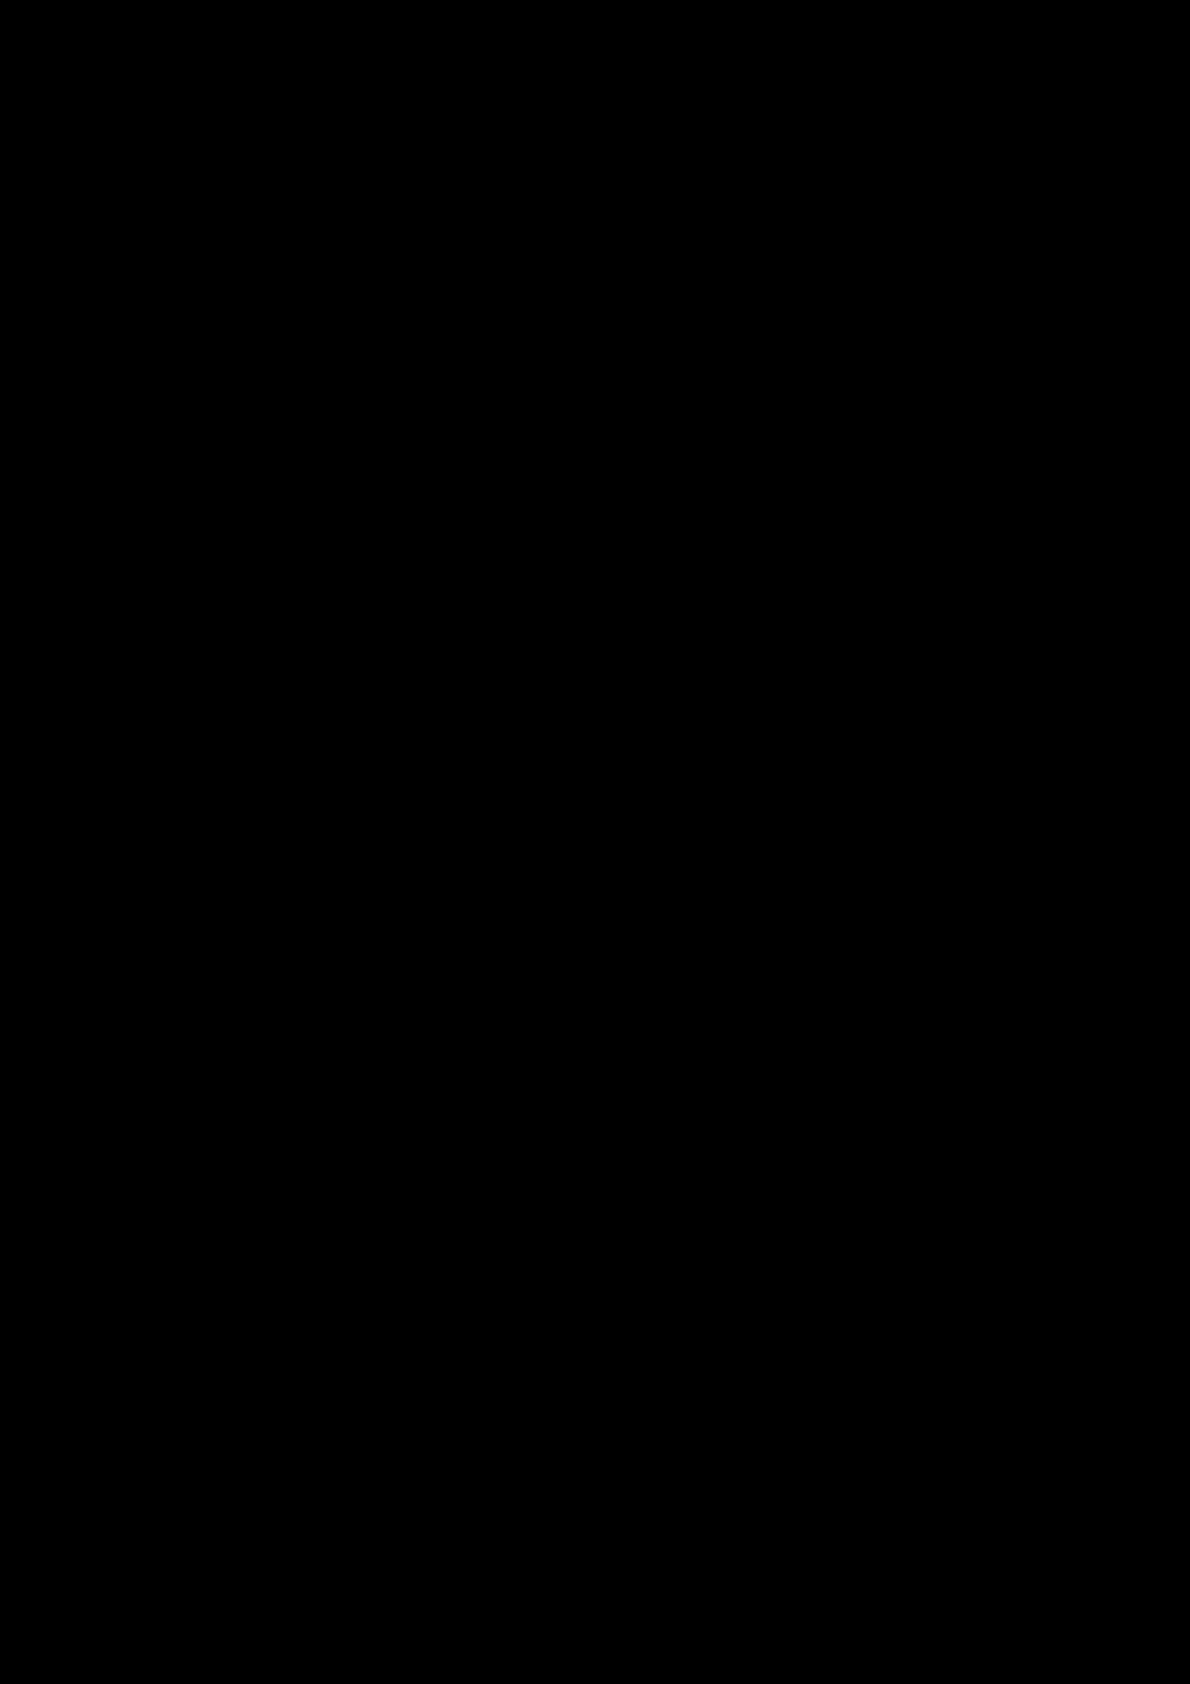 Autopia-presenta/specimen-autopia-b-bold.png